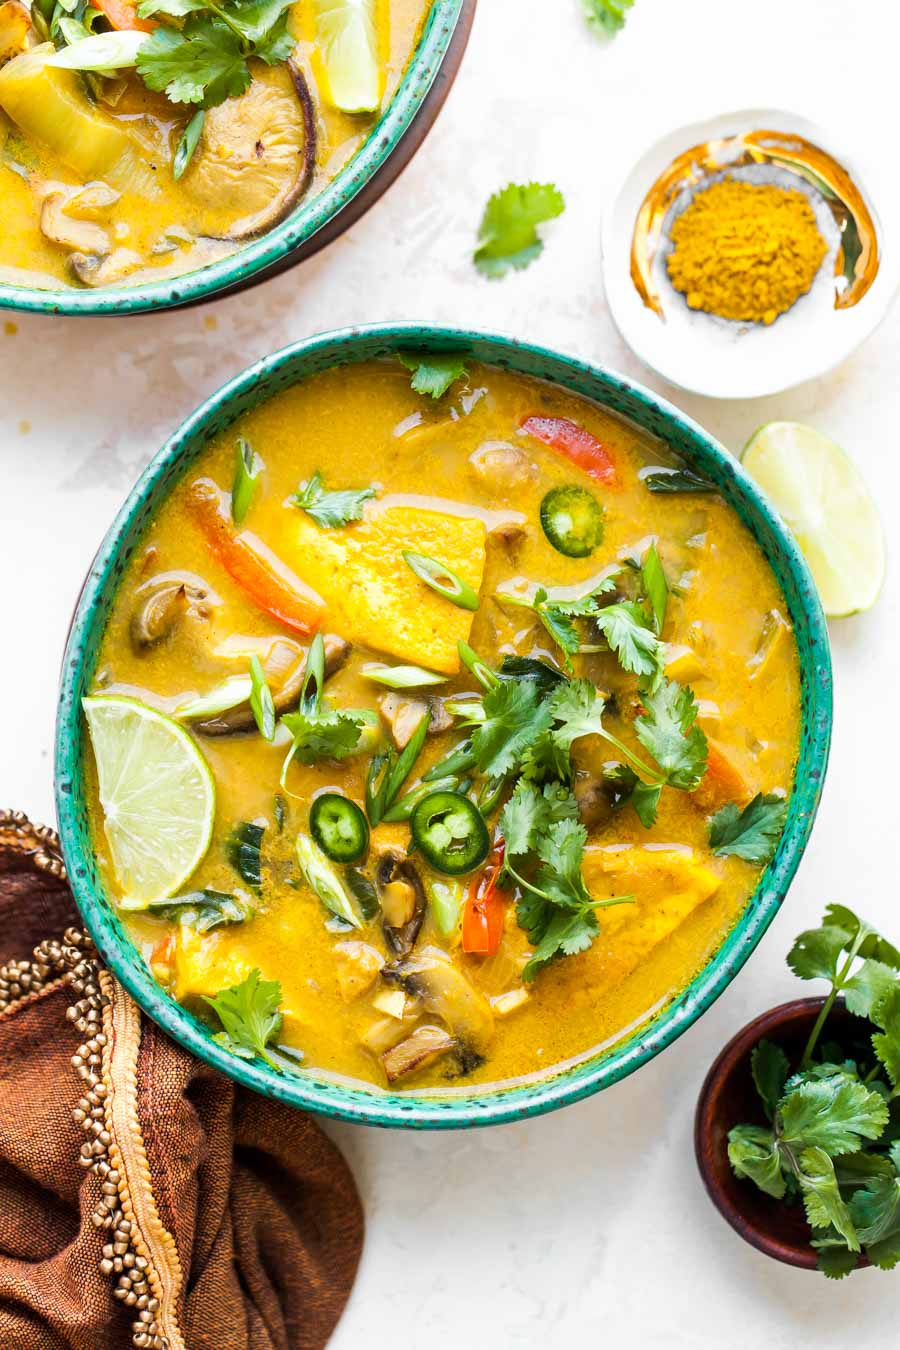 Thai Lemongrass Soup with Tofu